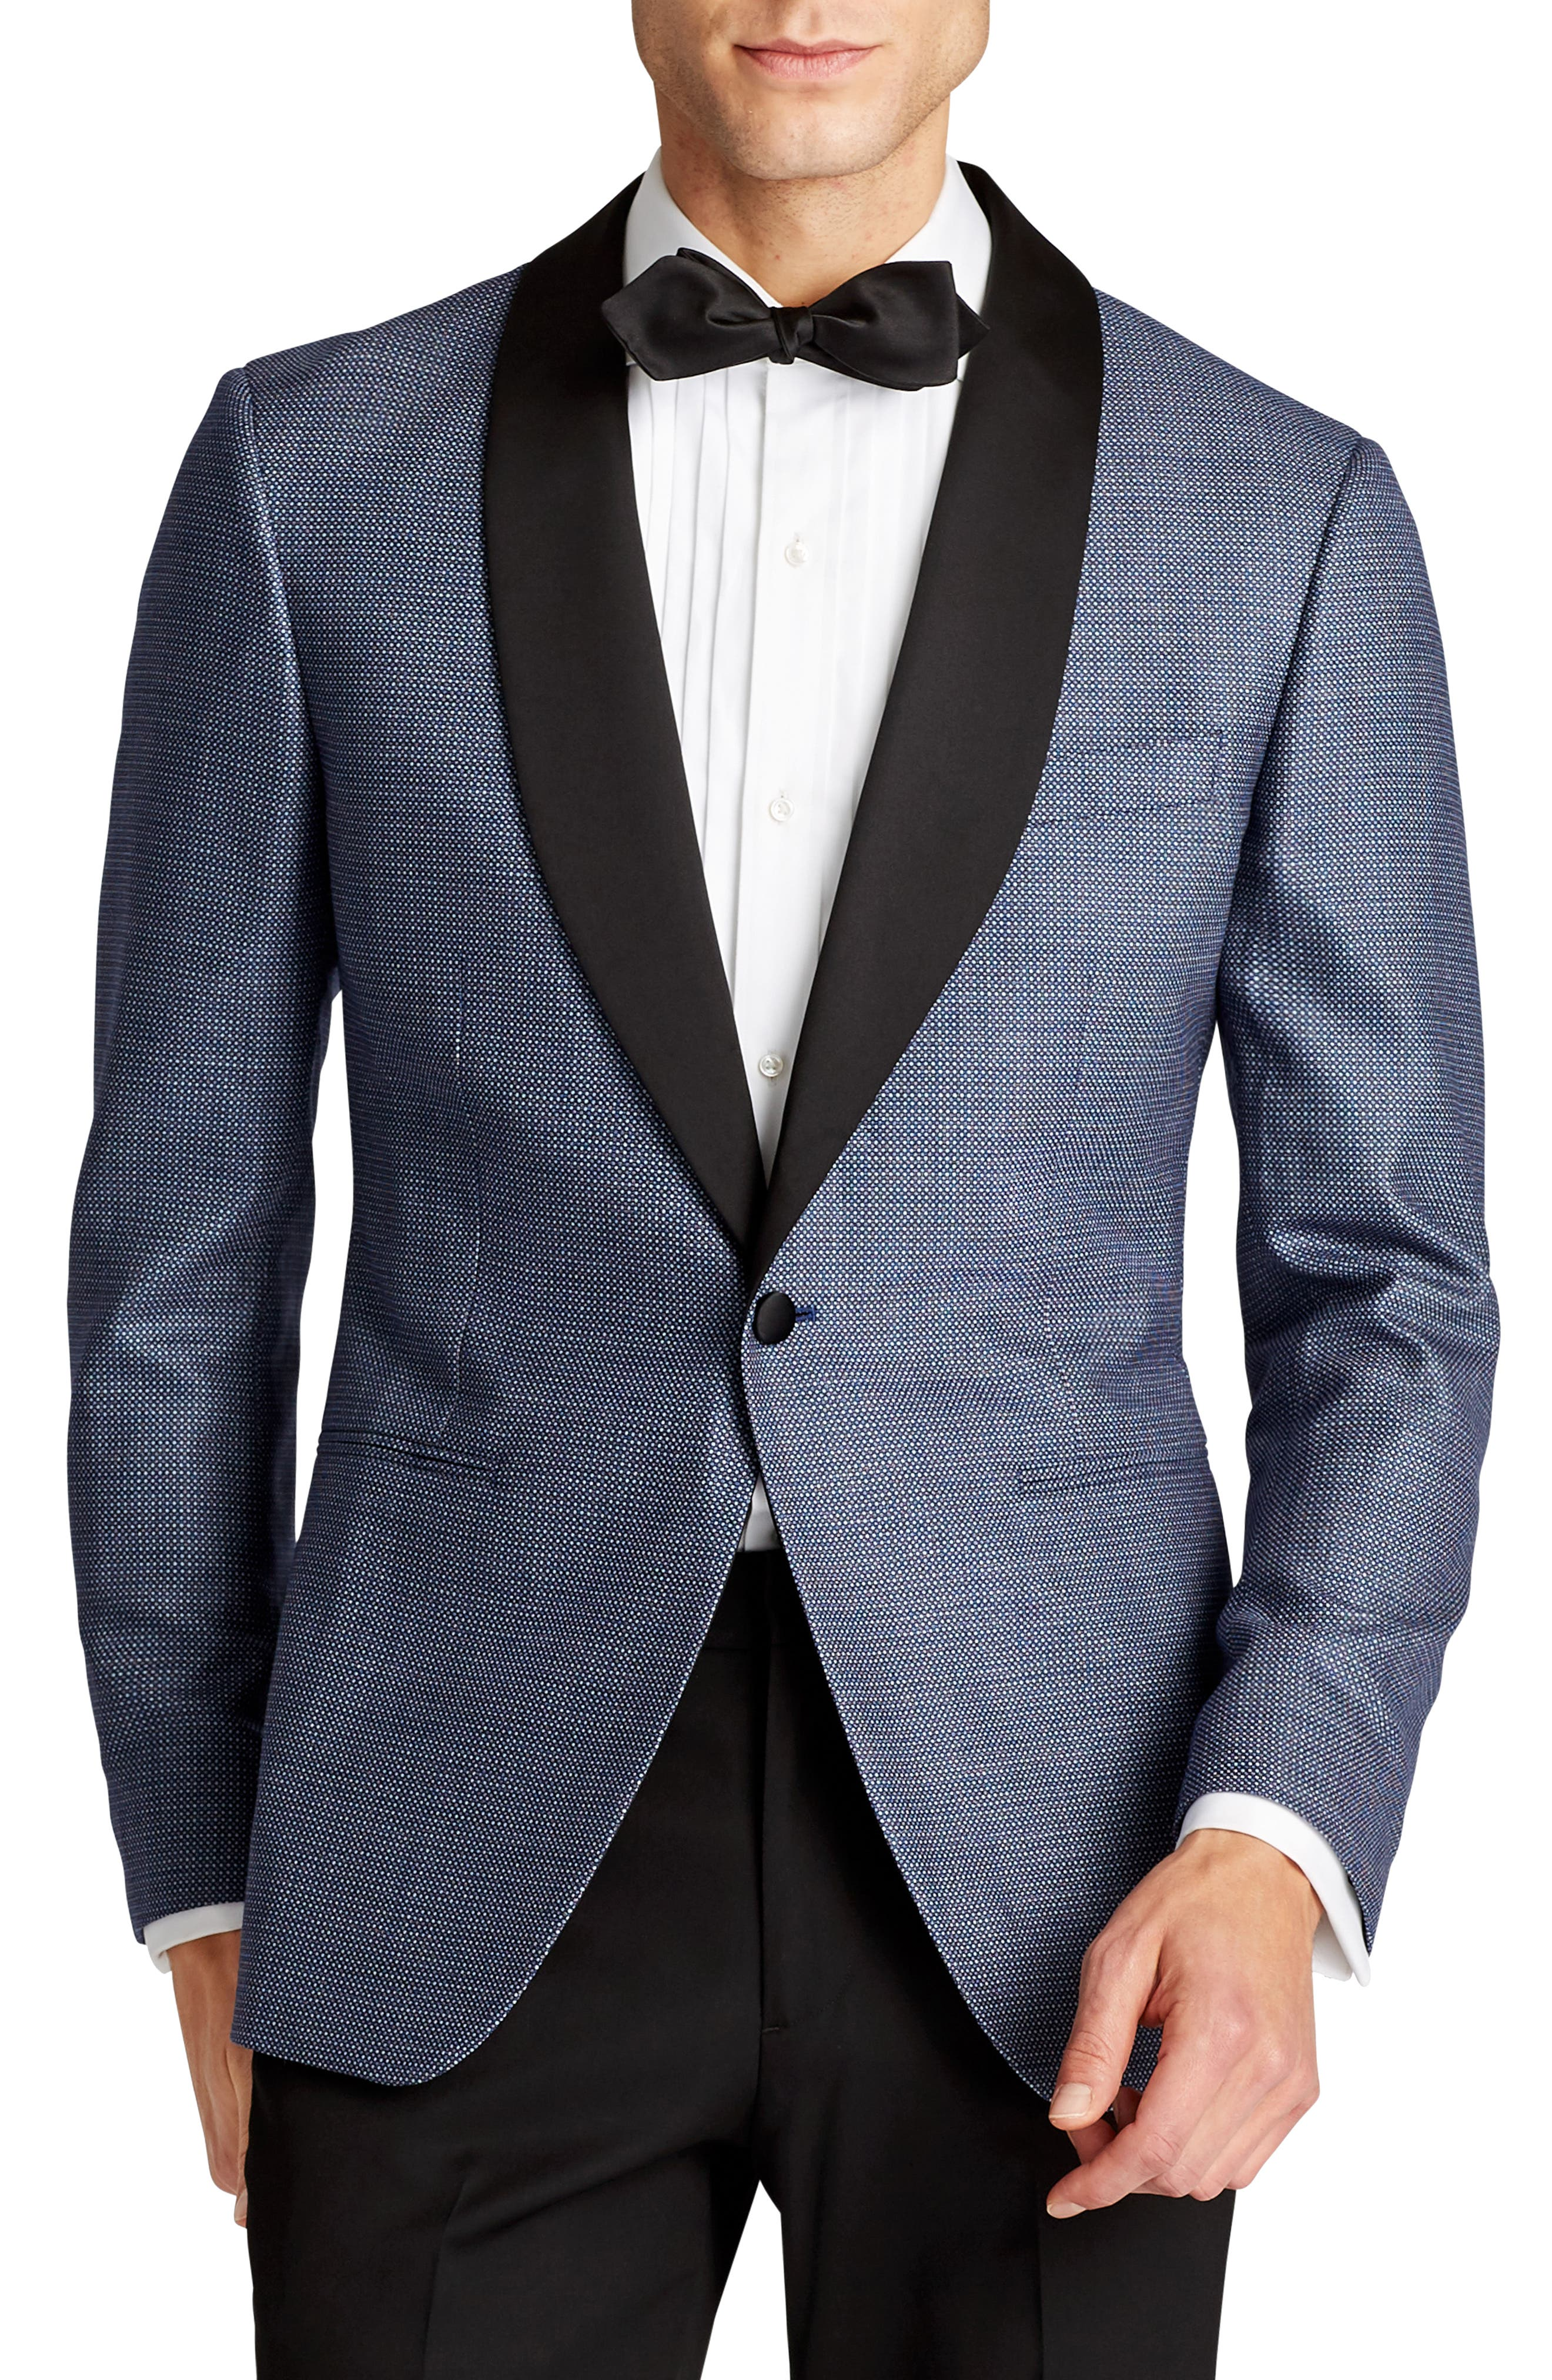 Capstone Slim Fit Wool Dinner Jacket,                         Main,                         color, Blue Dot